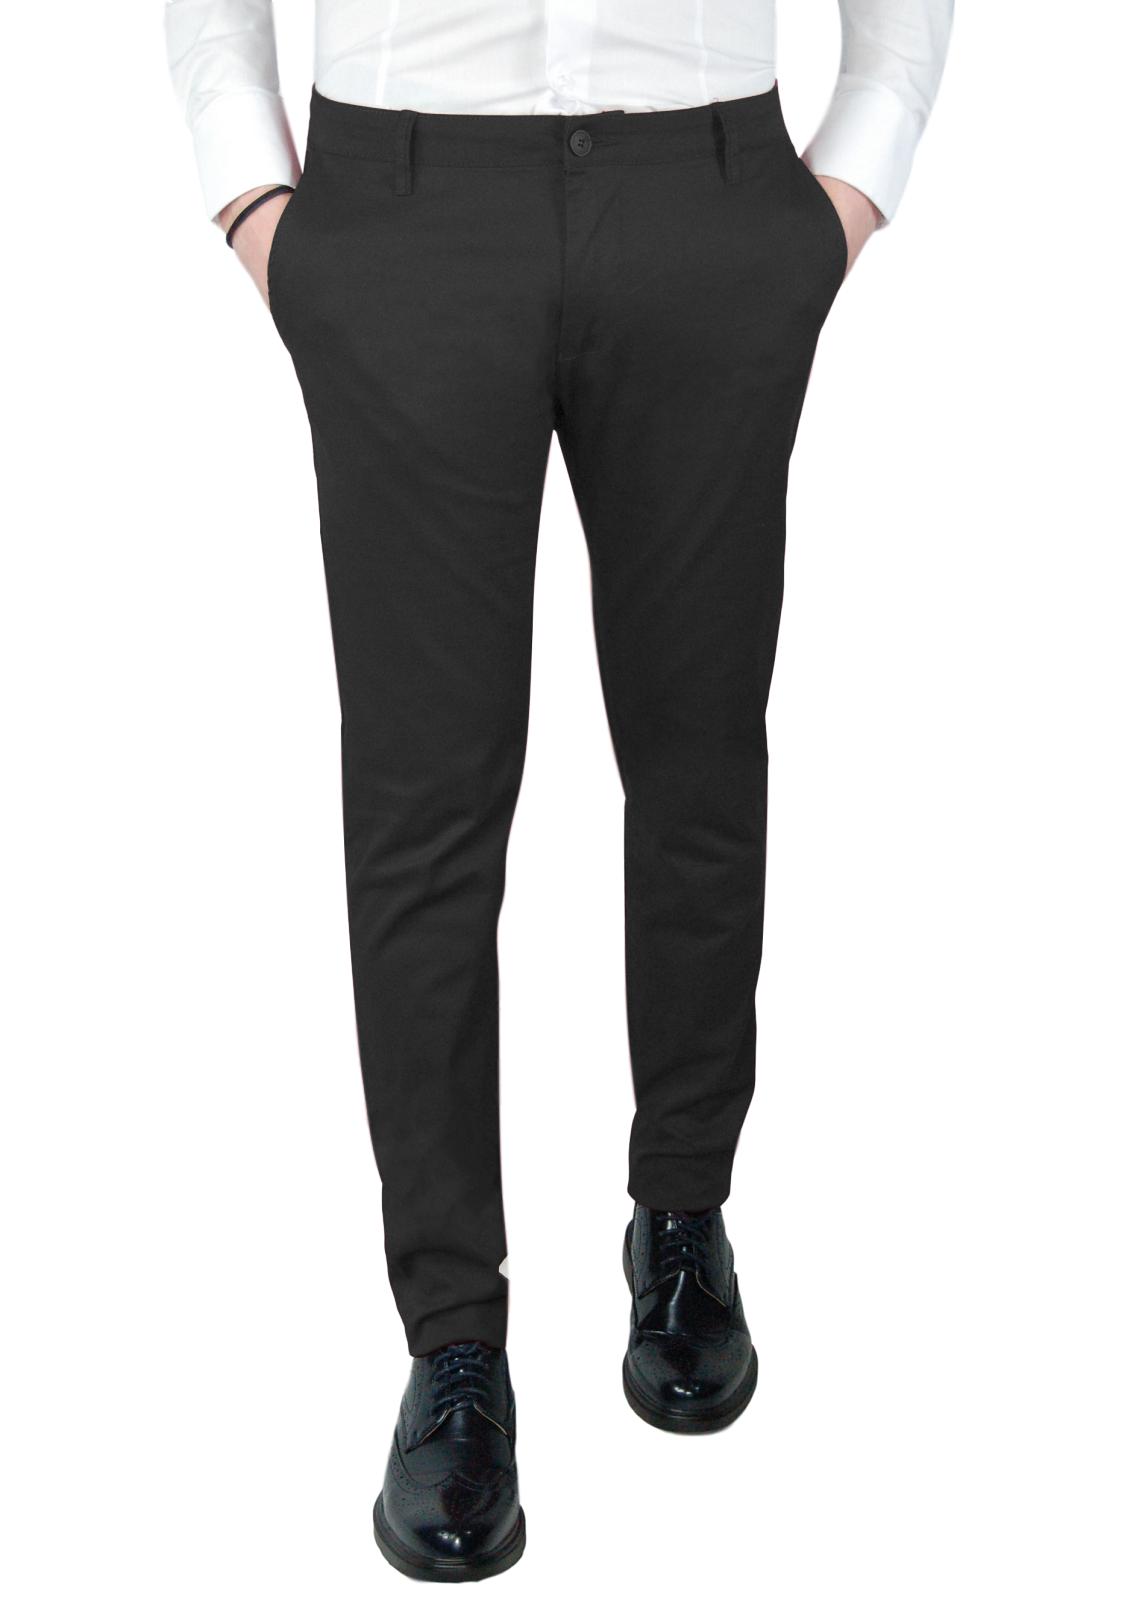 Pantalone-Uomo-Invernale-Slim-Fit-Chino-tasca-america-Cotone-Blu-Nero-Verde miniatura 12